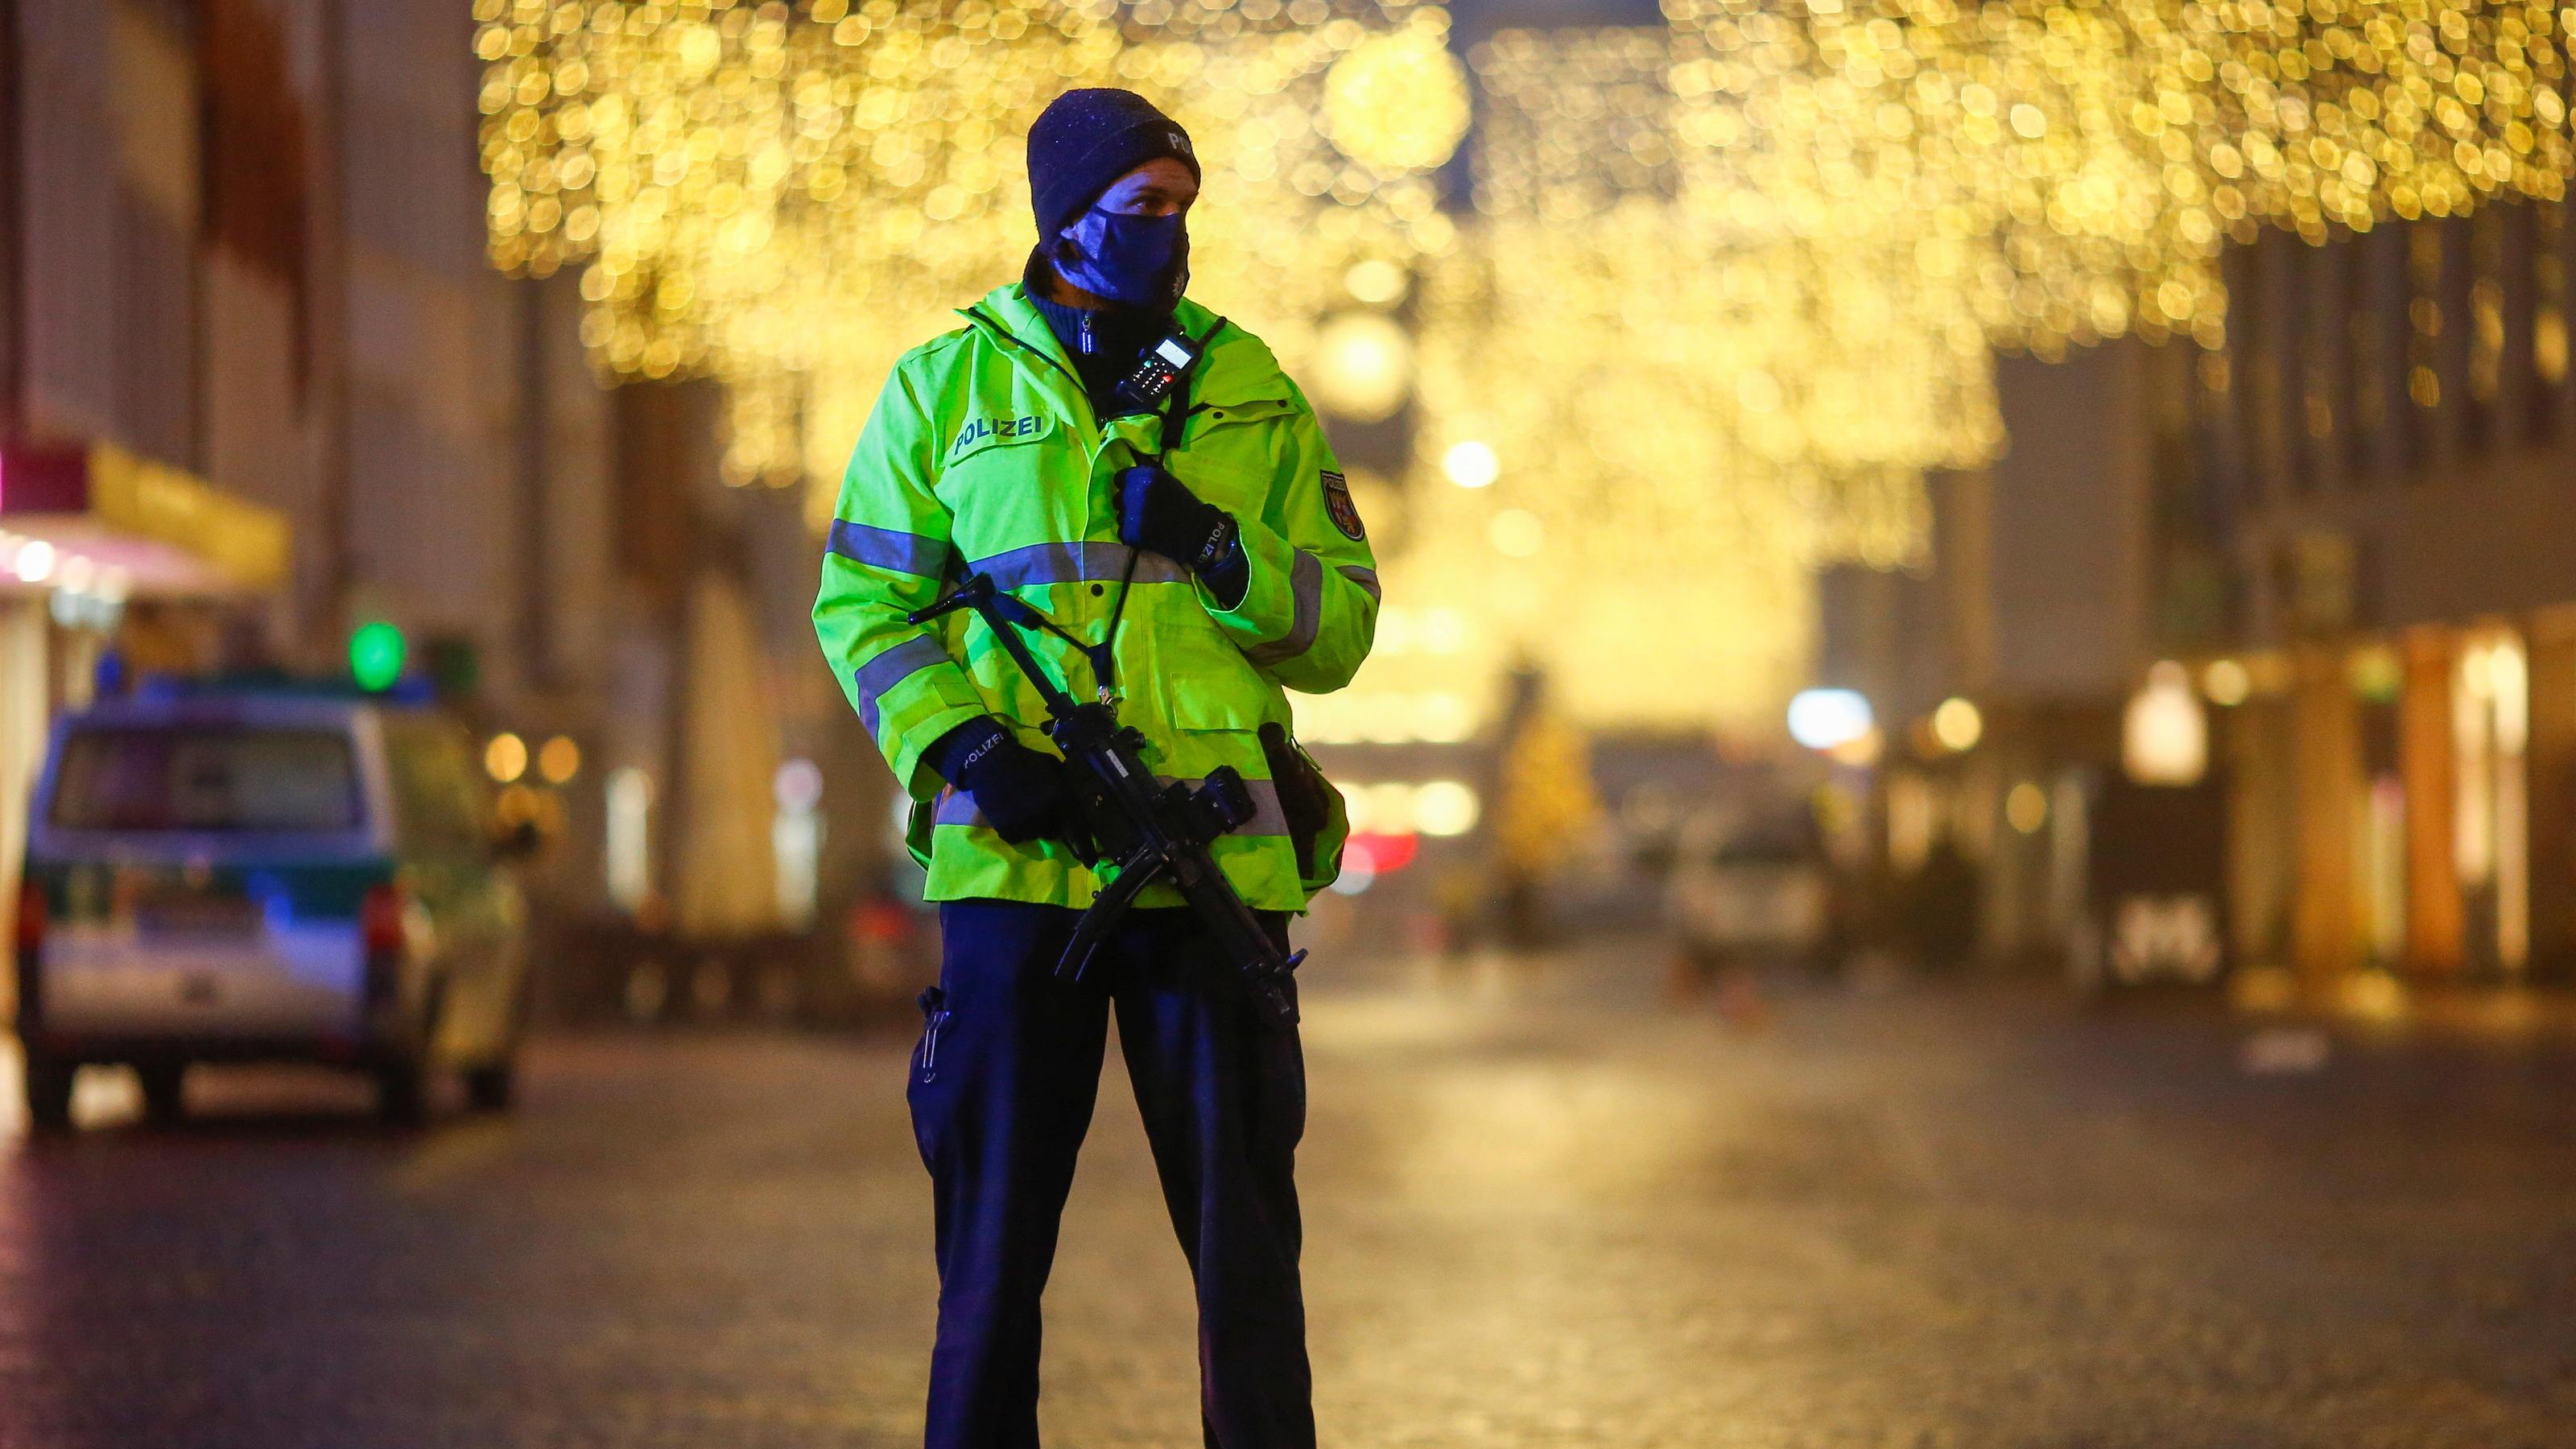 Staatsanwaltschaft Trier: Staatsanwaltschaft ermittelt wegen vierfachen Mordes